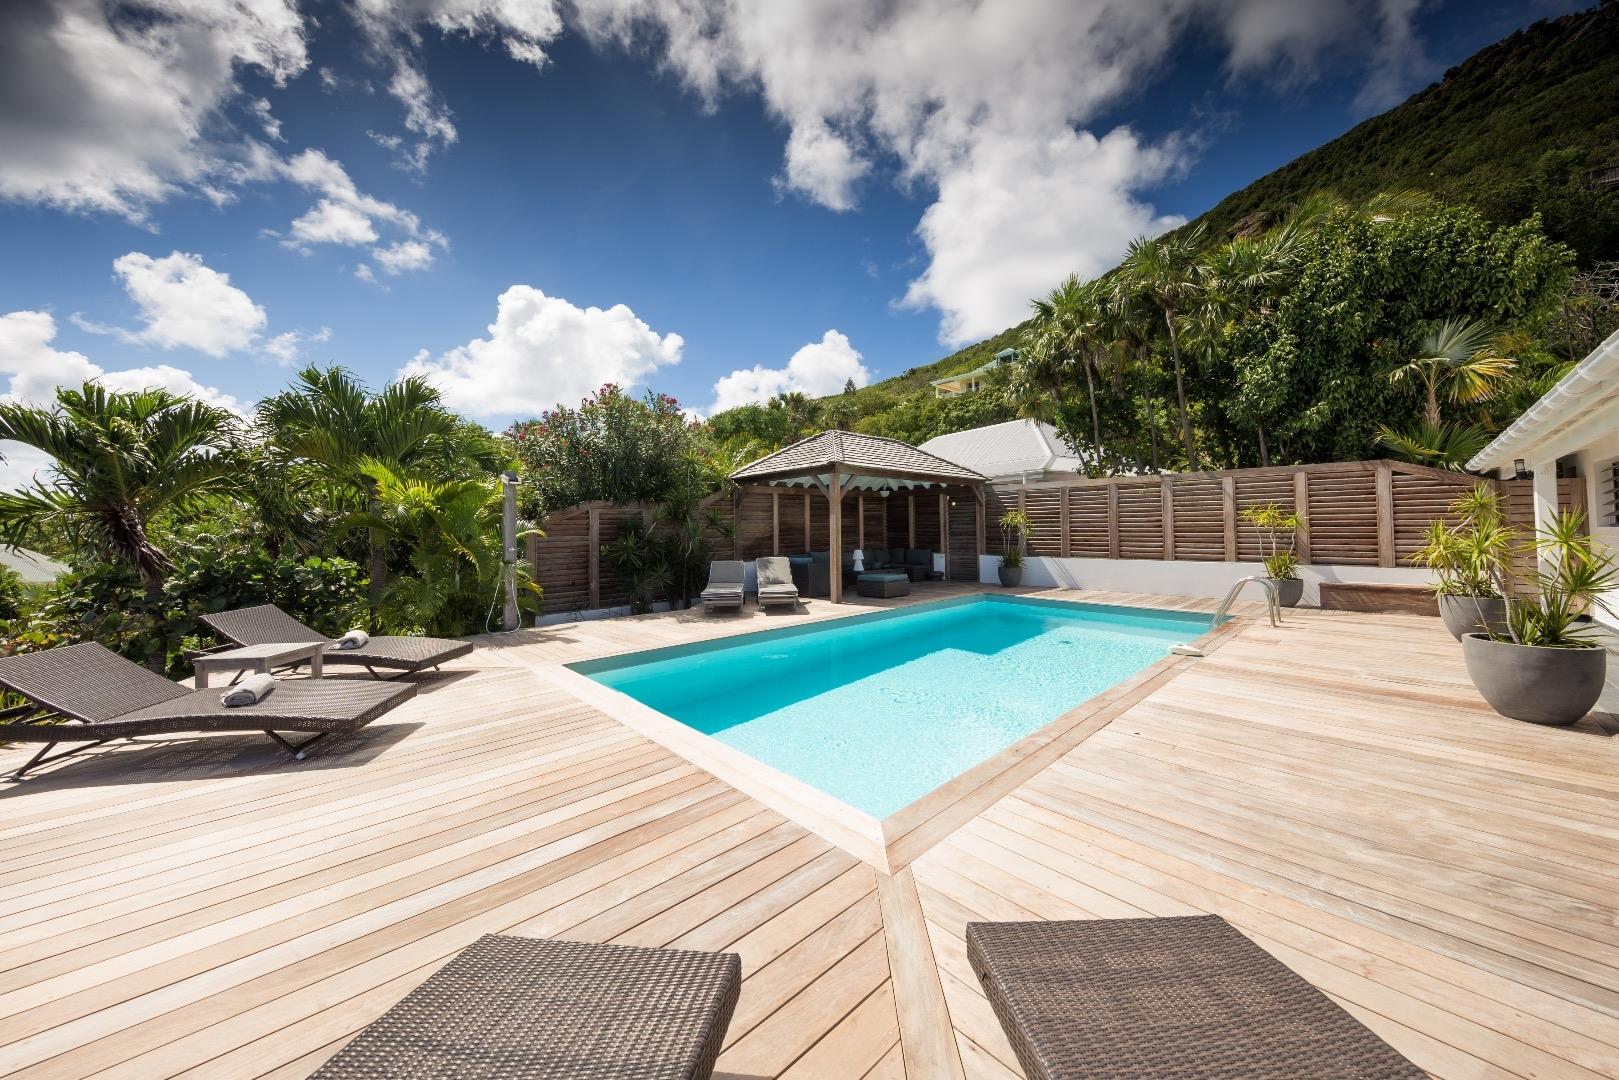 Luxury villa rentals caribbean - St barthelemy - Deve - No location 4 - Manonjul 1 - Image 1/33